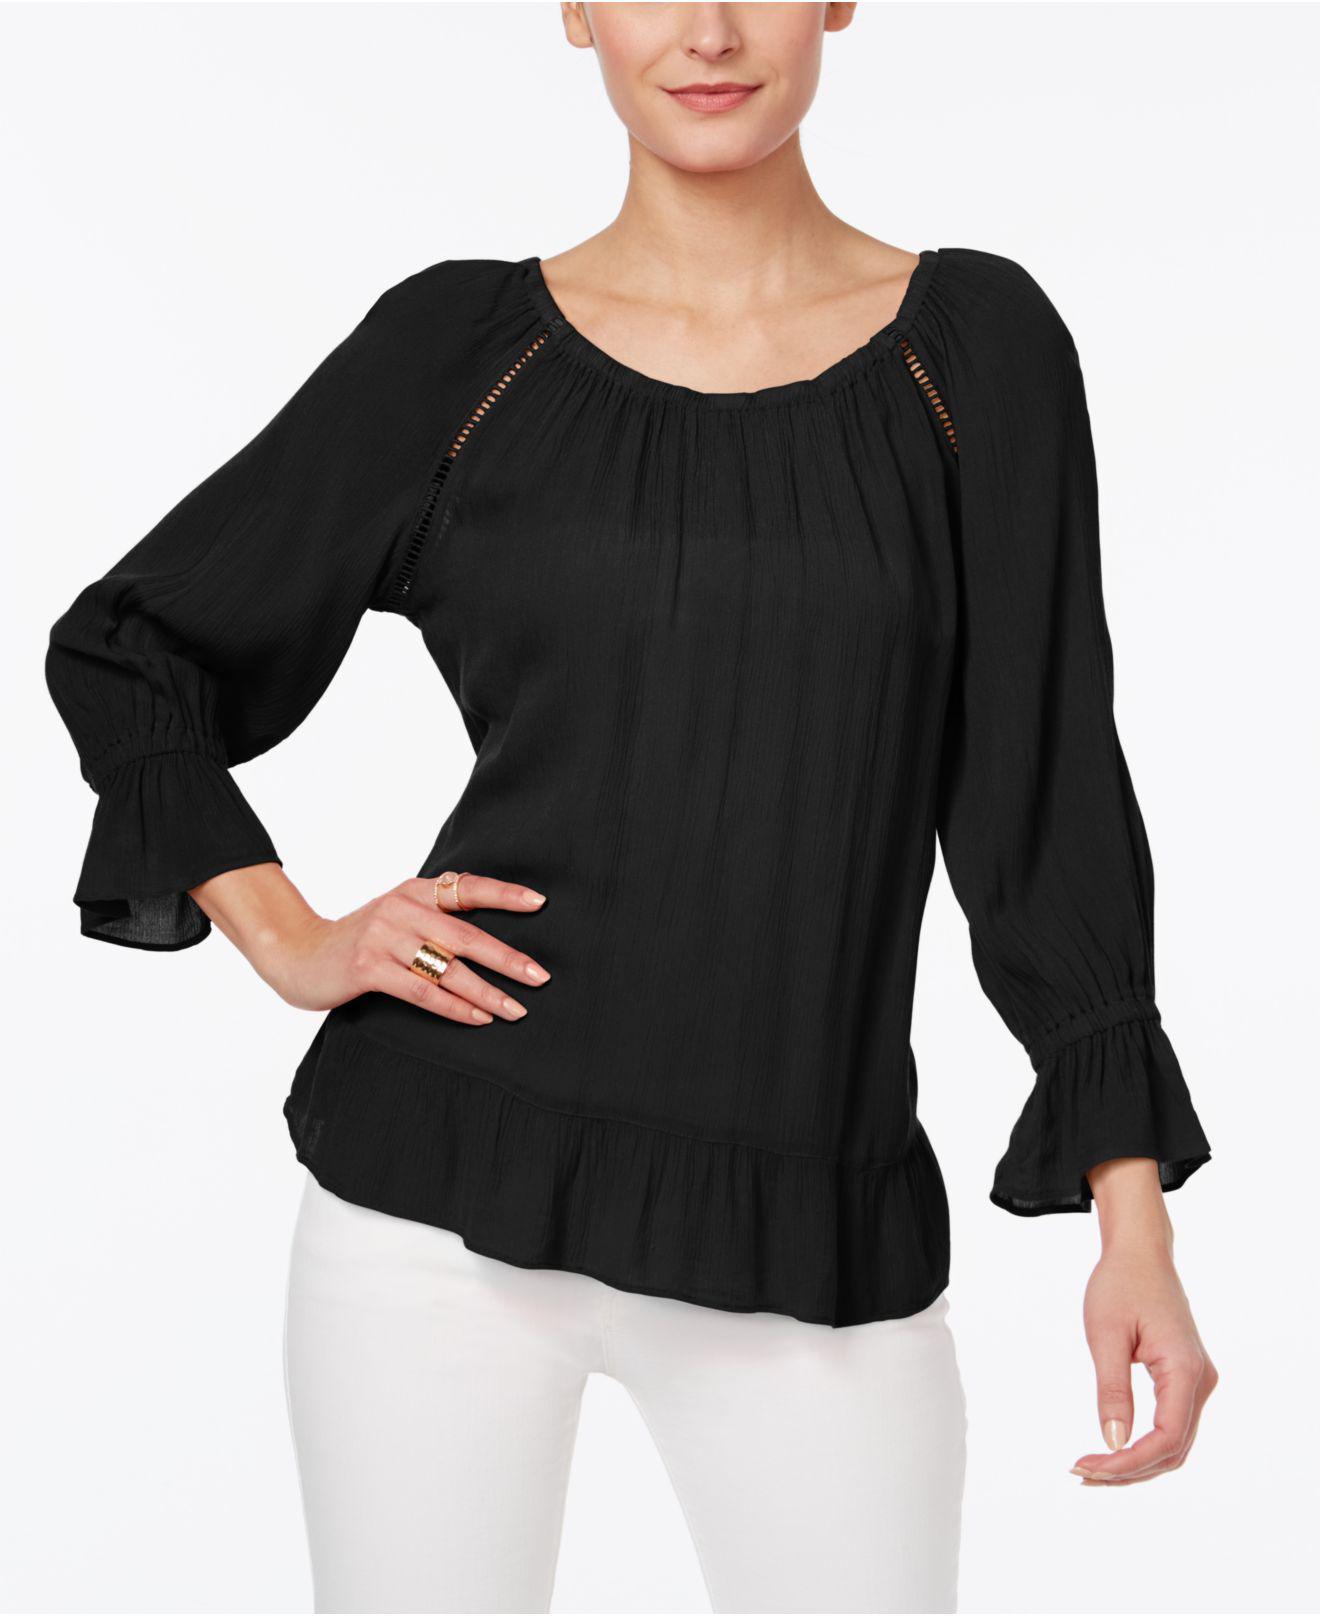 63db738ec5a528 INC International Concepts. Women's Black I.n.c. Petite Crochet-trim Peasant  Top ...